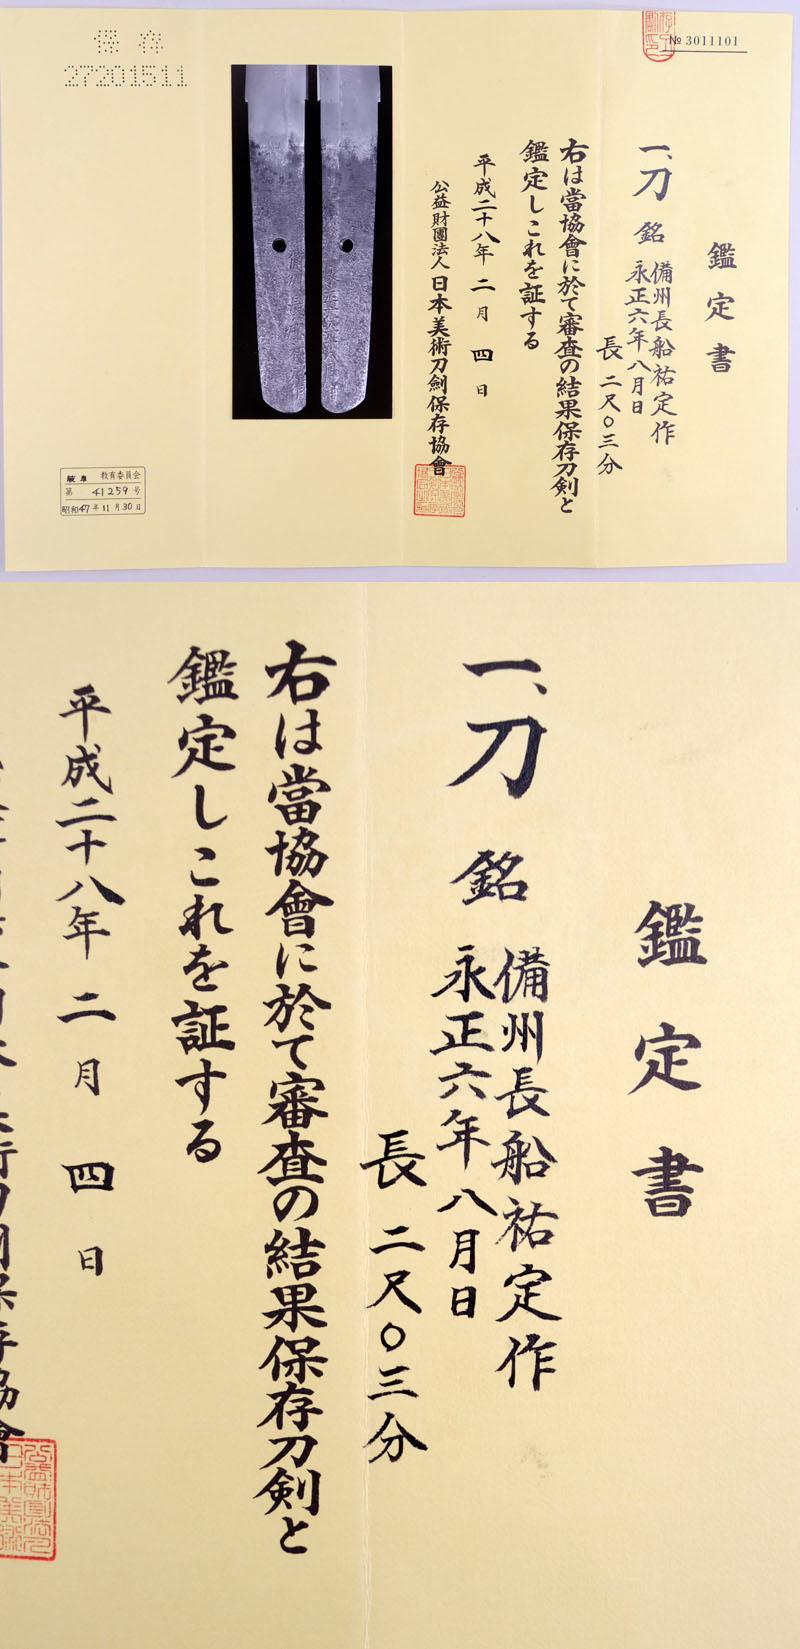 備州長船祐定作 Picture of Certificate